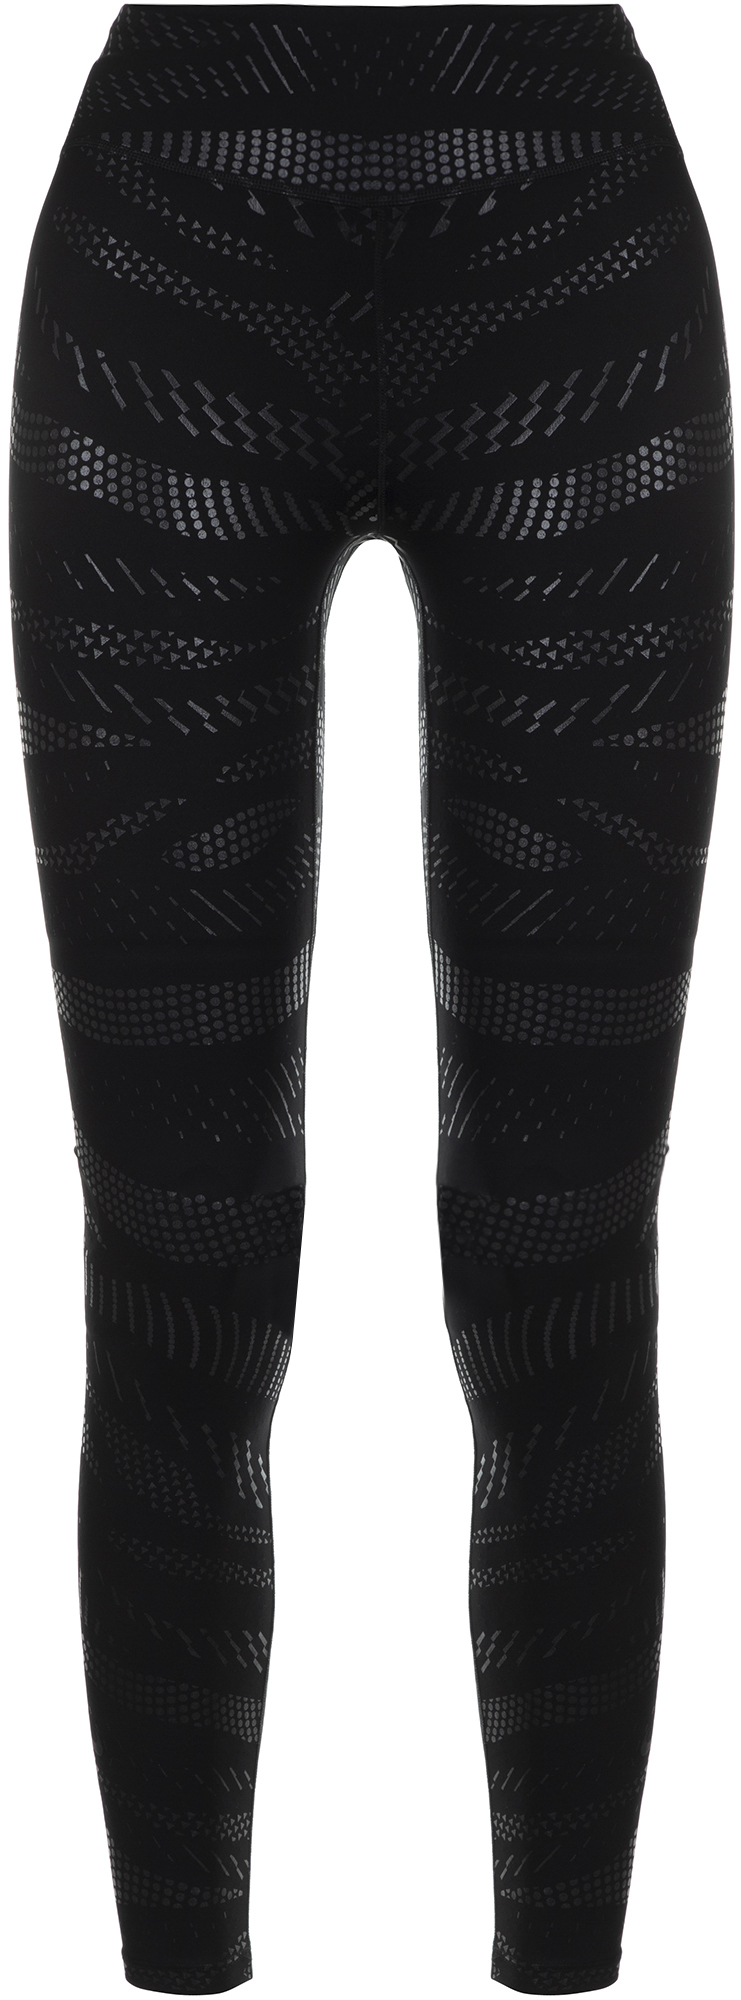 Nike Легинсы женские Nike All-In, размер 40-42